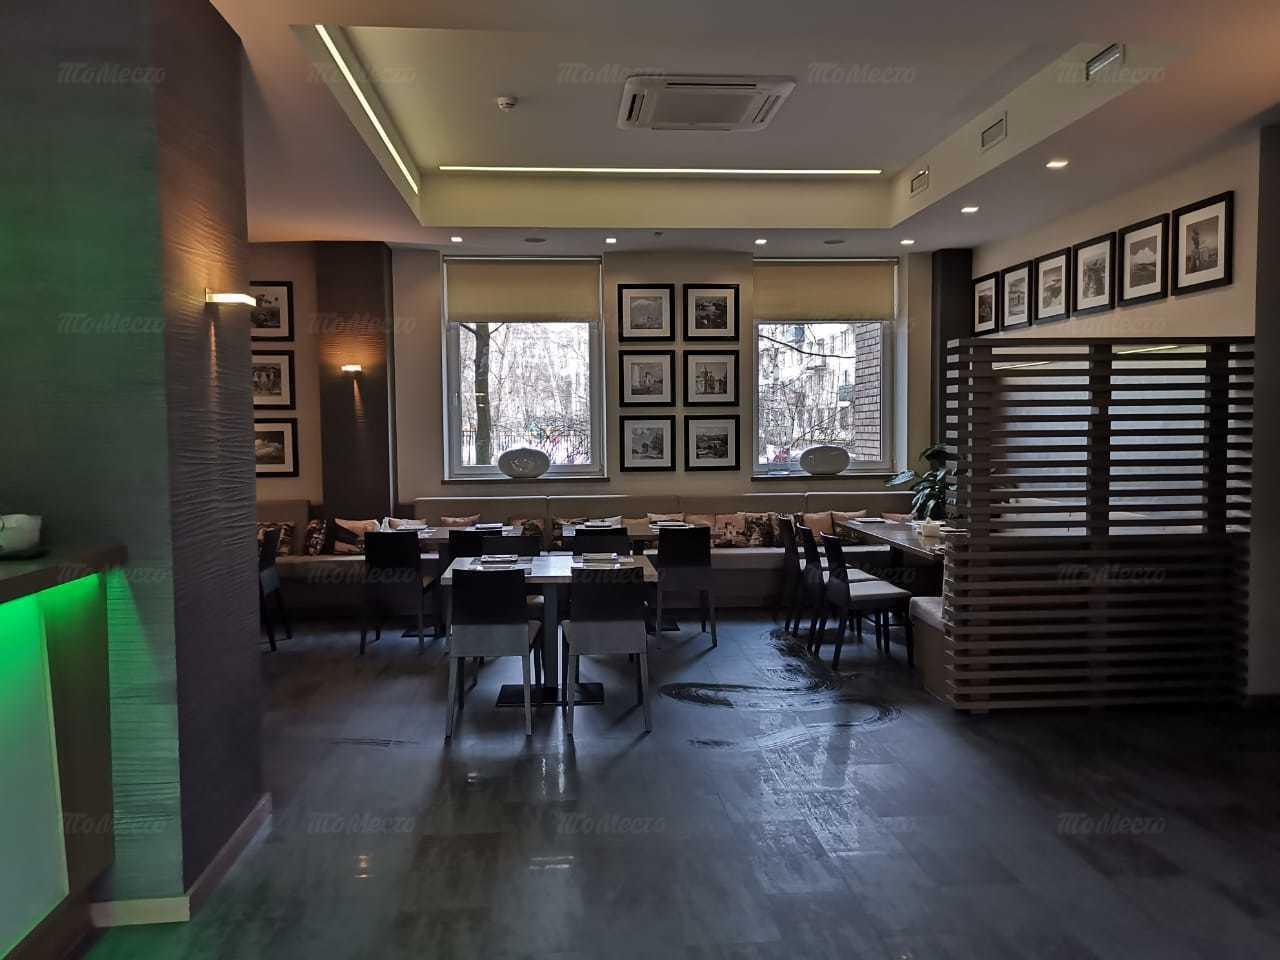 Ресторан Чаман на улице Димитрова